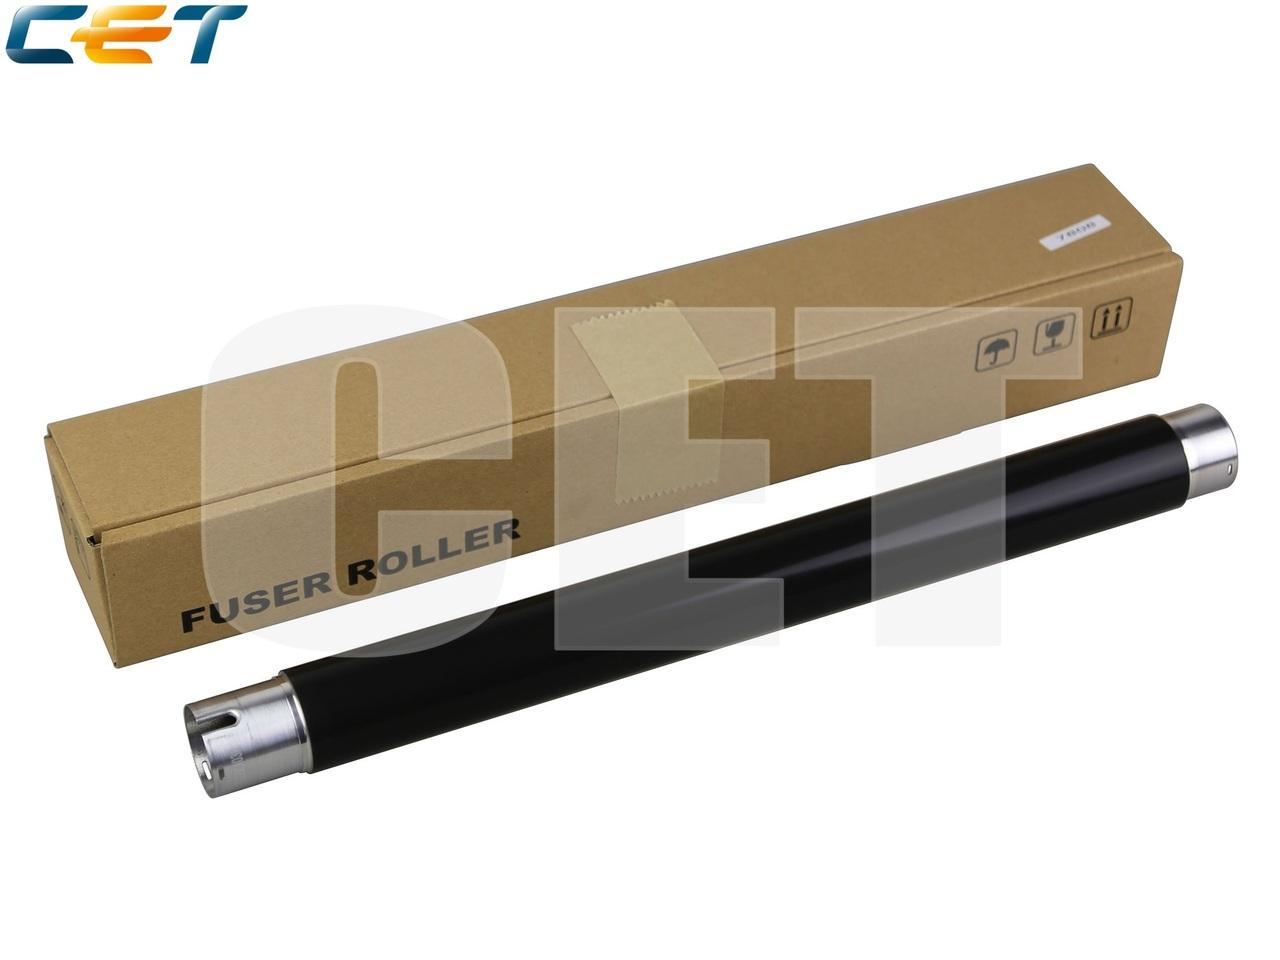 Тефлоновый вал для KYOCERA TASKalfa 3500i/4500i/5500i(CET), CET7808